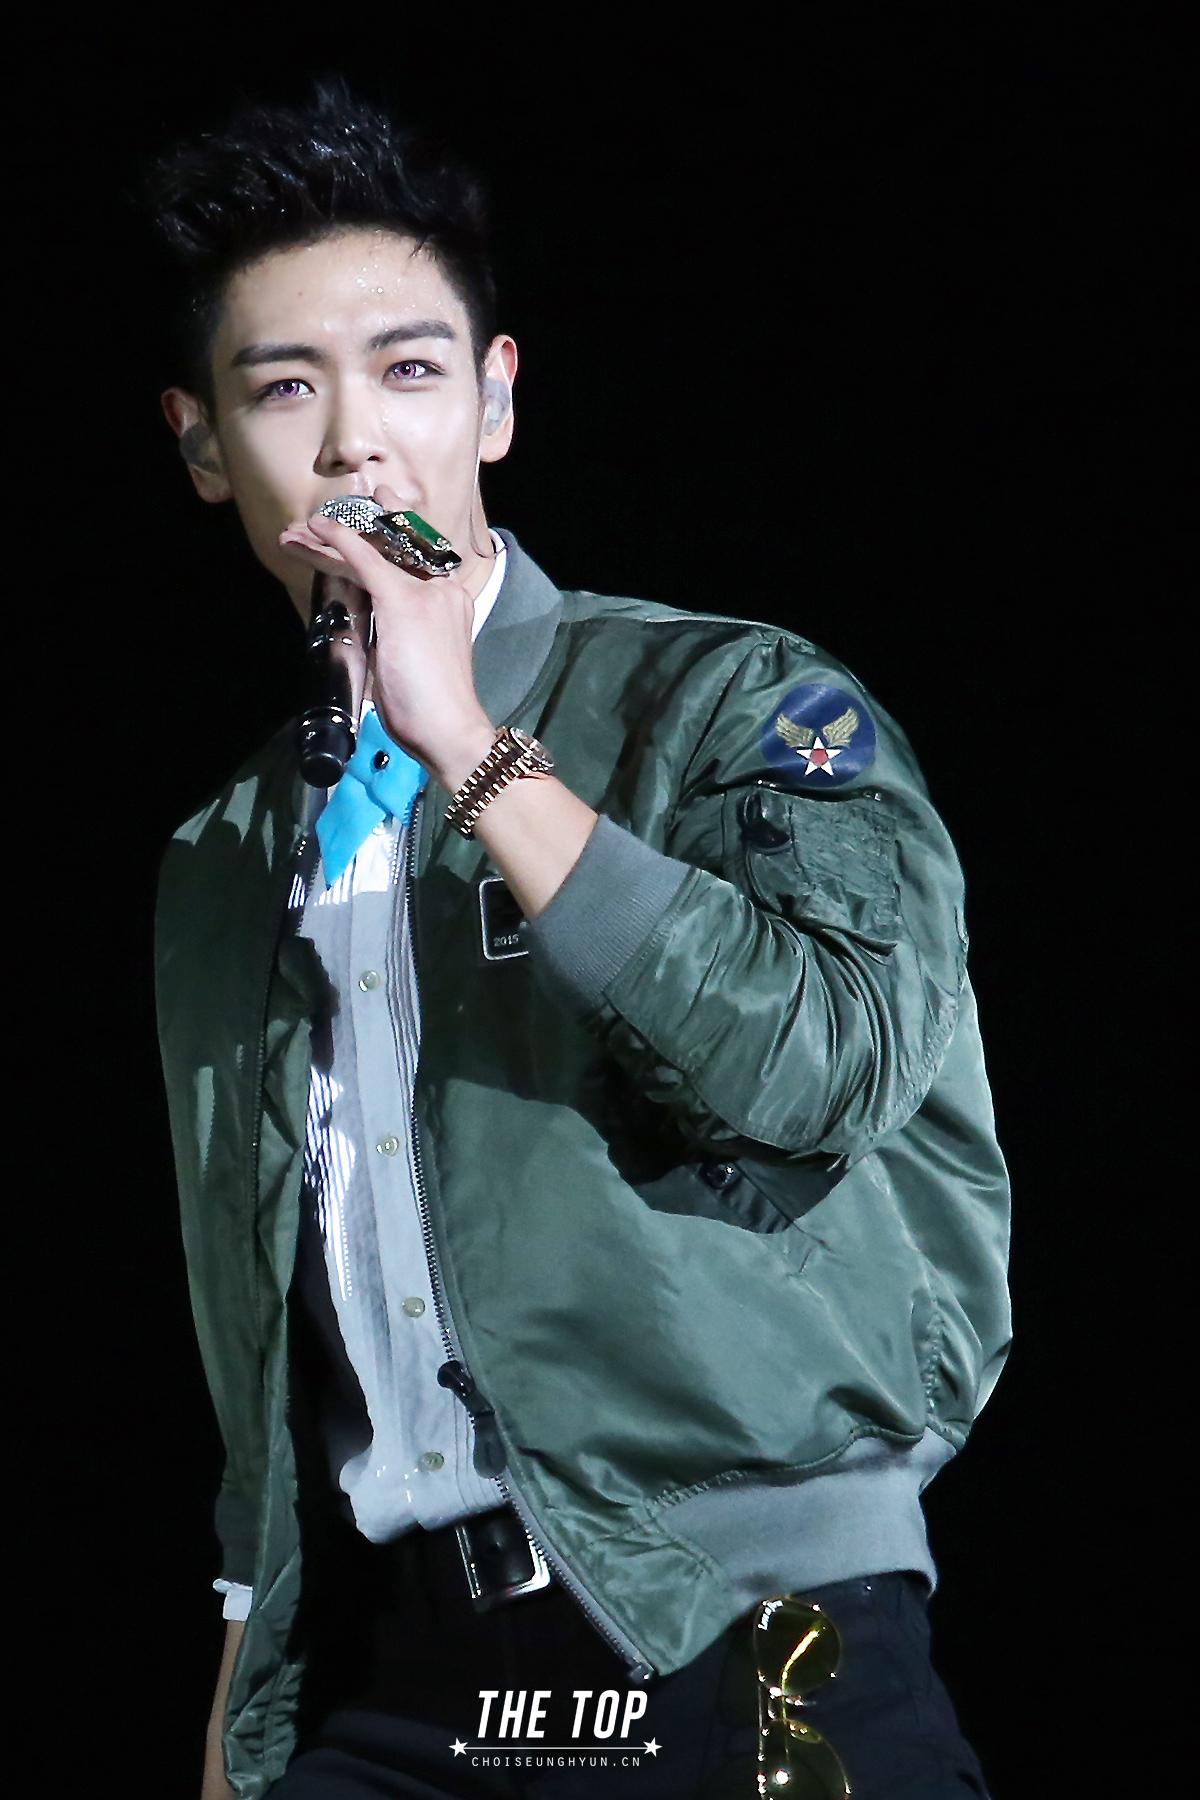 BIGBANG - Made Tour - Tokyo - 14nov2015 - The TOP - 08.jpg